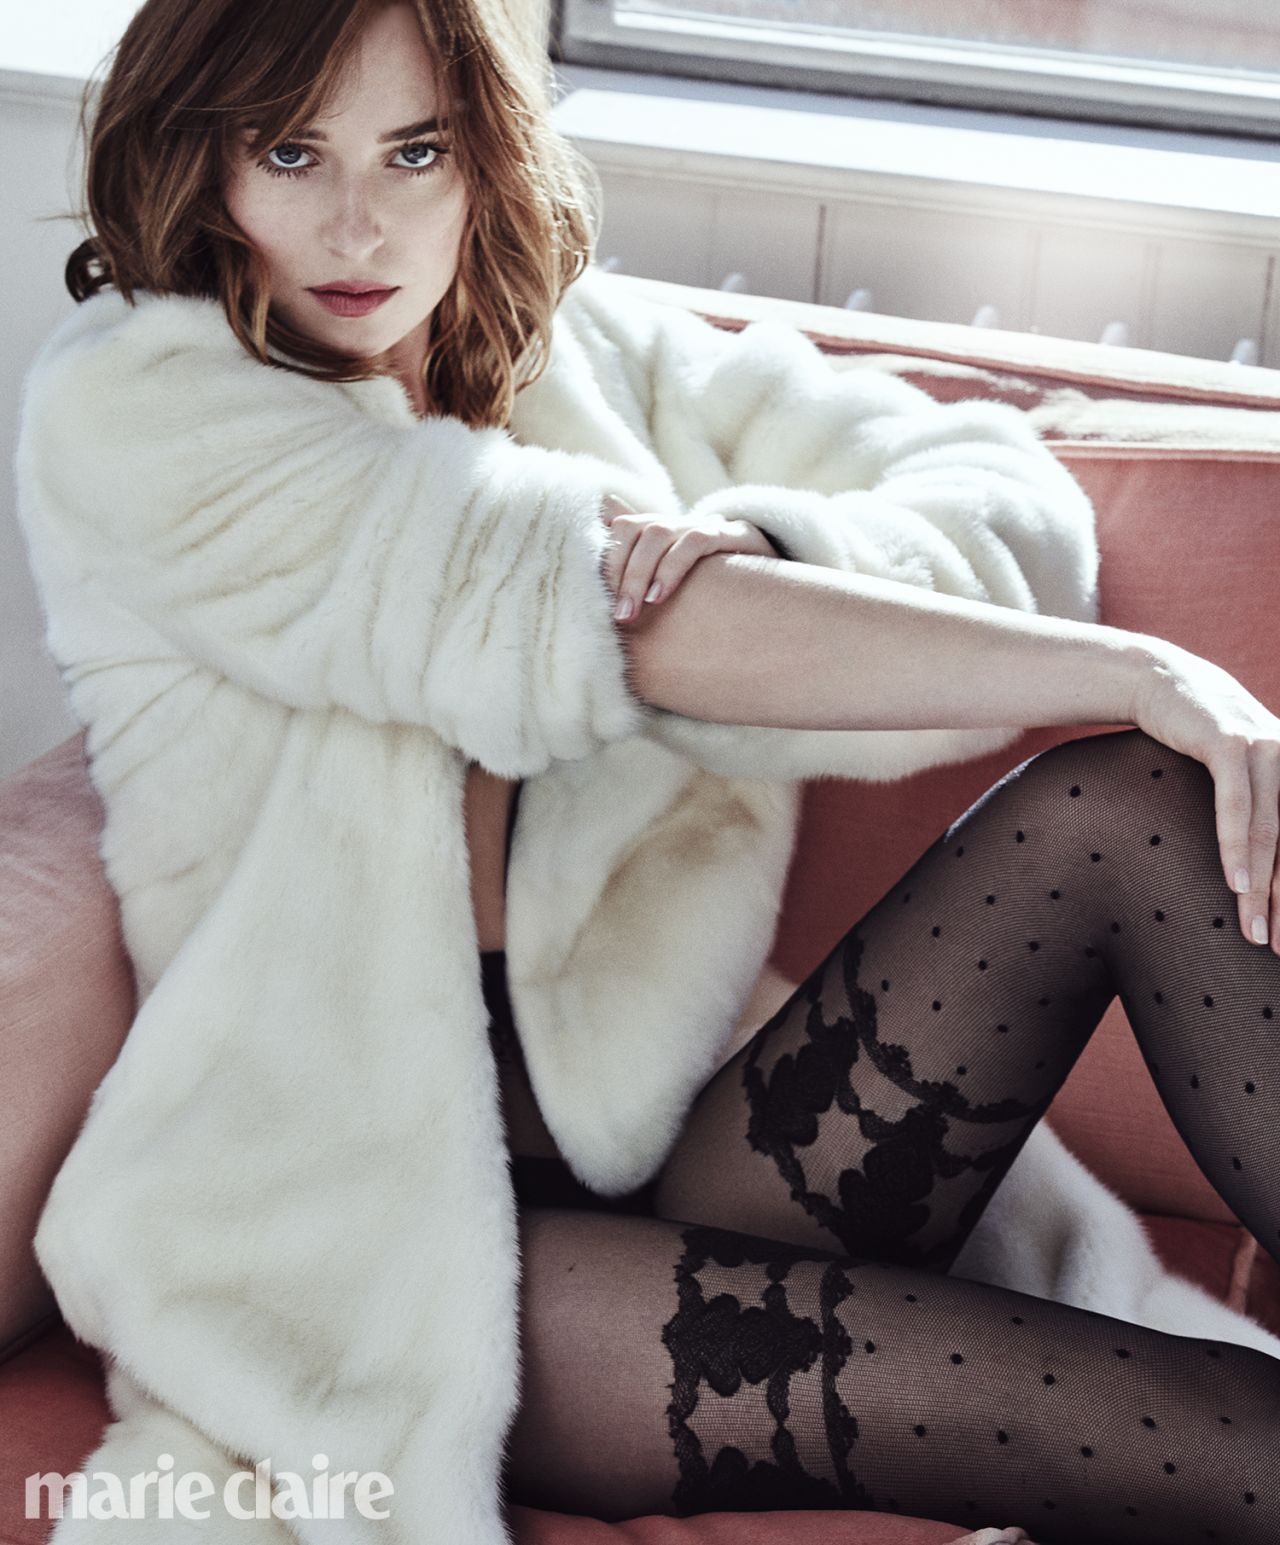 image Kylie jenner modeling lingerie